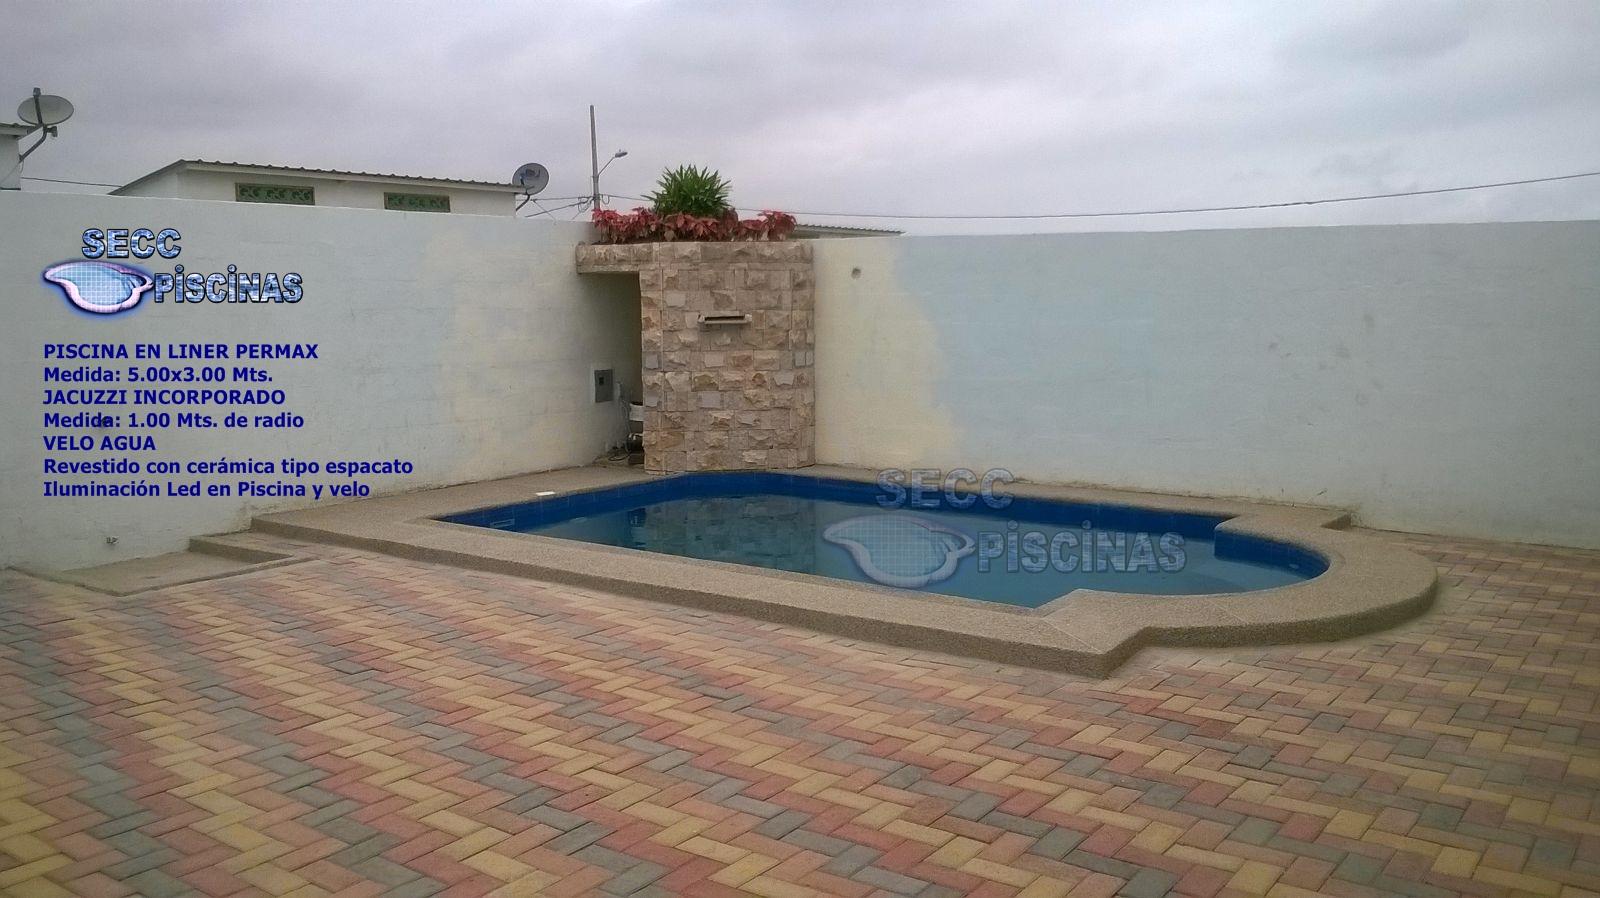 Secc piscinas piscinas con jacuzzi incorporado for Construccion de piscinas en ecuador